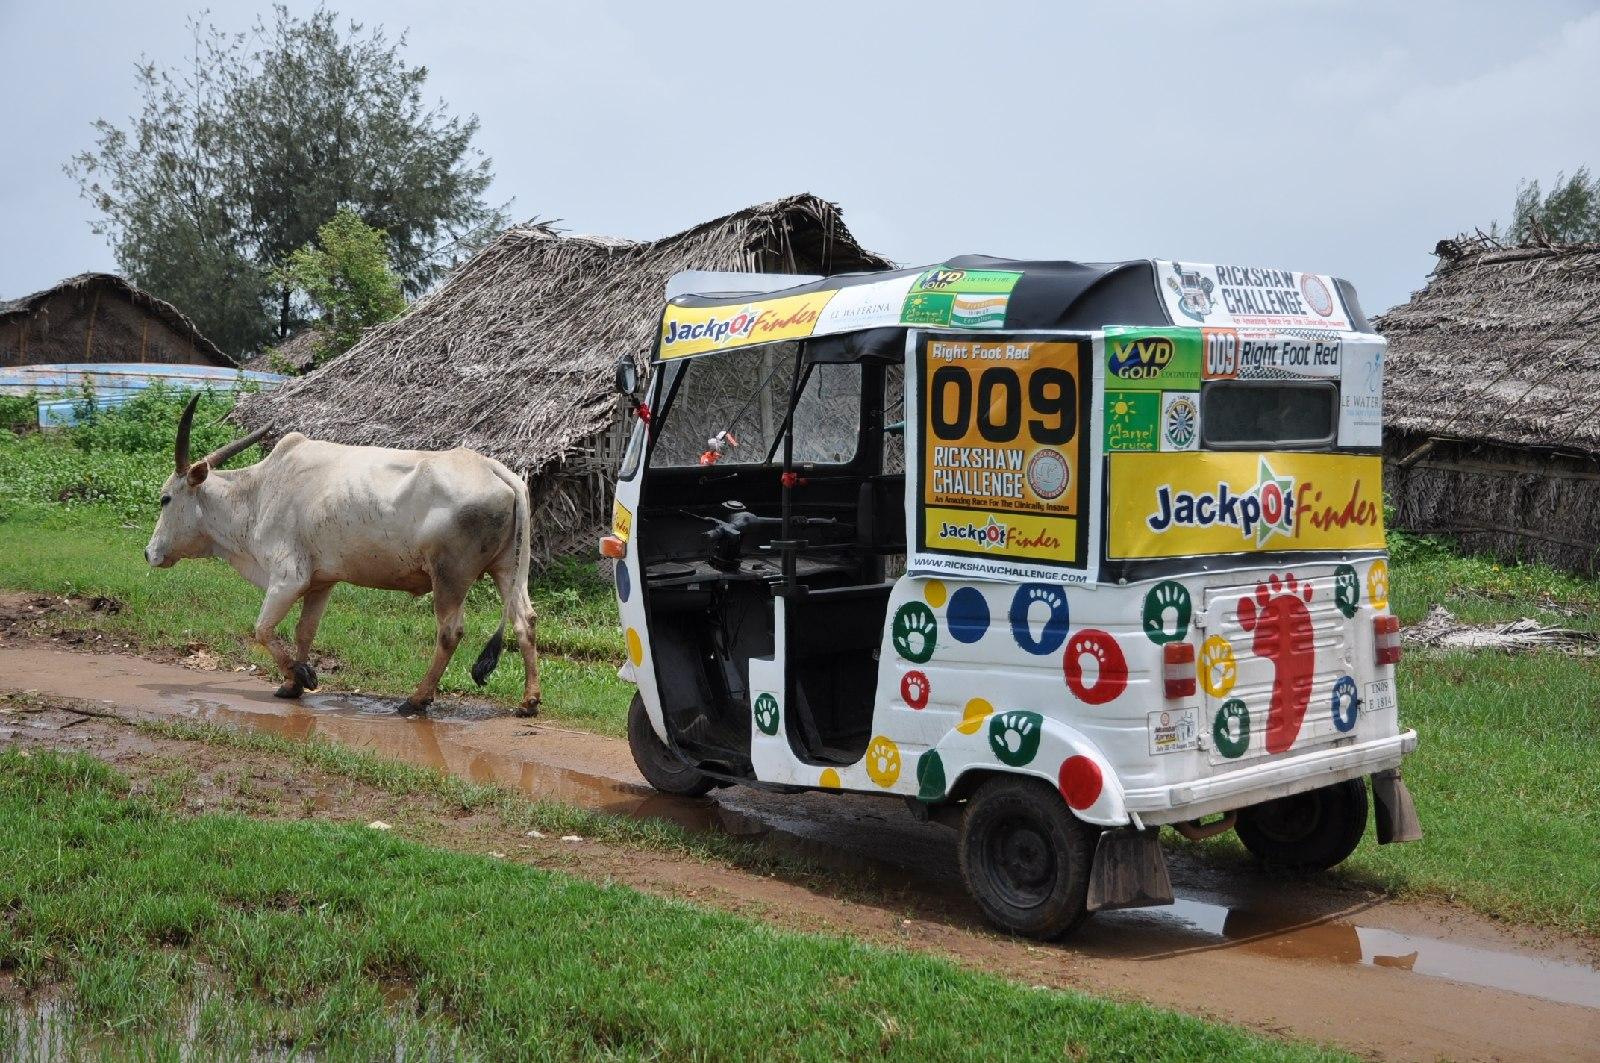 Auto Rickshaw For Rent In Trivandrum: The Great Indian Rickshaw Challenge